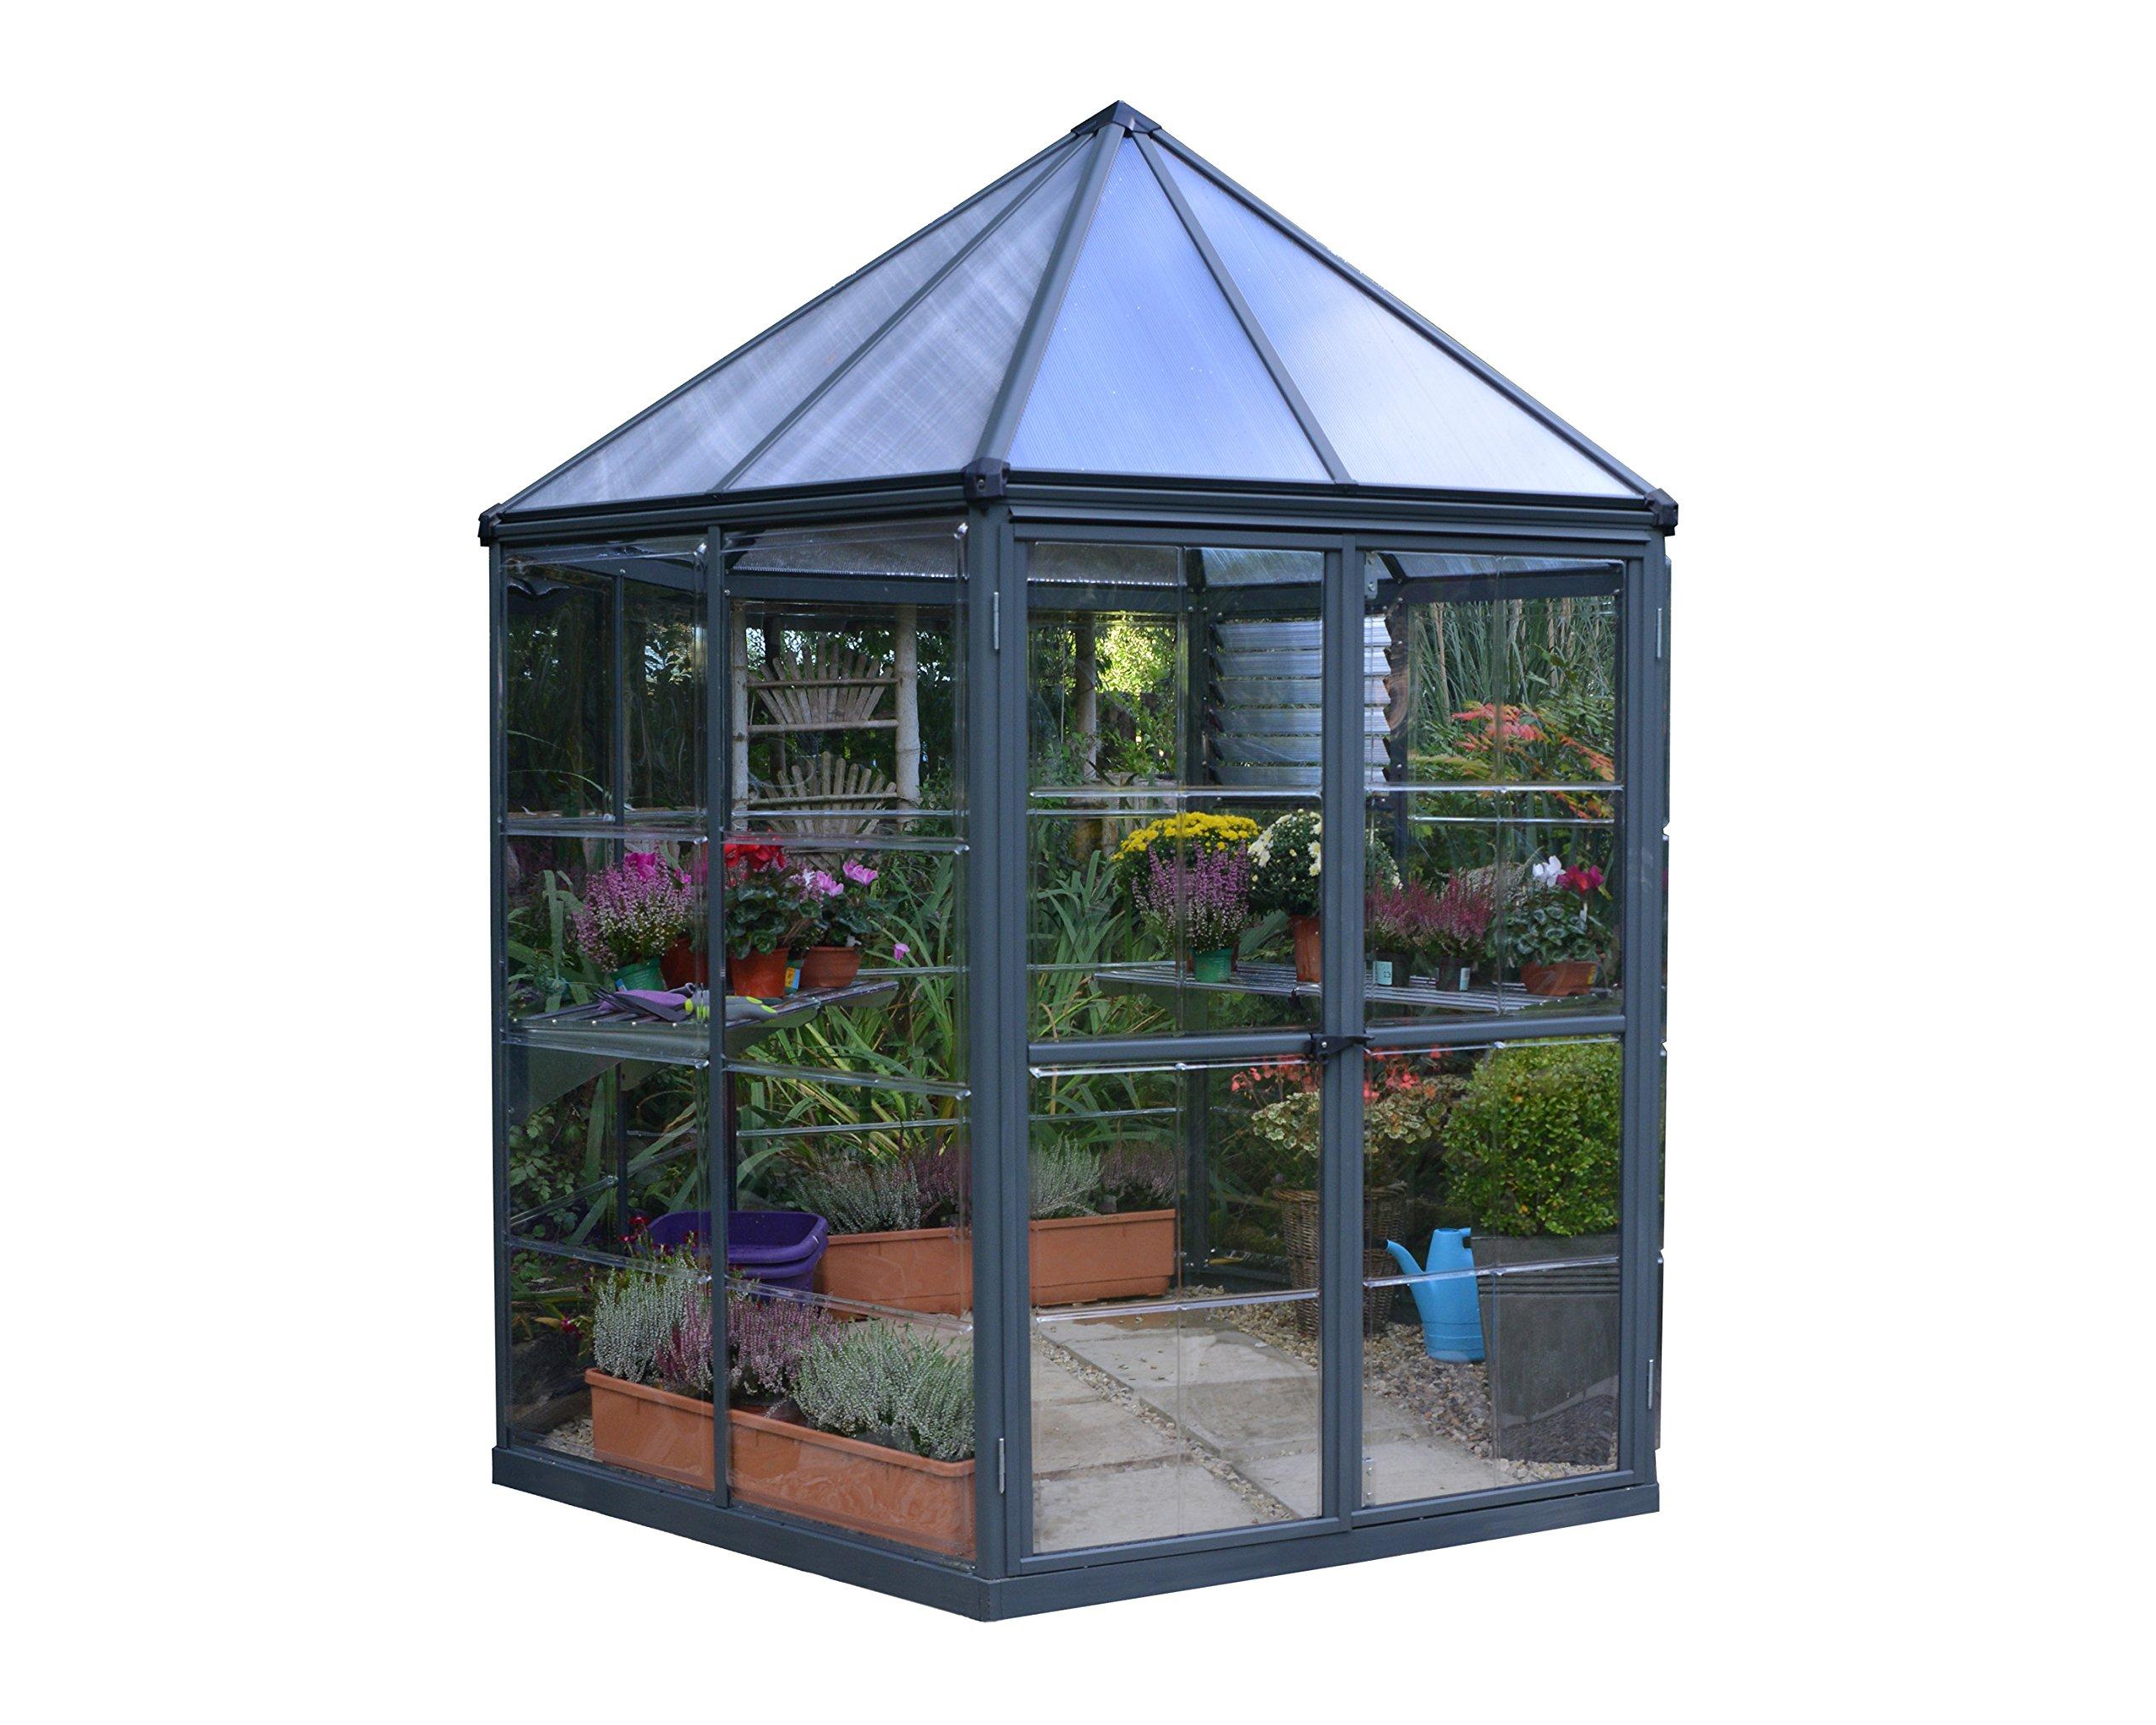 Palram Oasis Hobby Greenhouse, 7' x 8' x 9', Gray